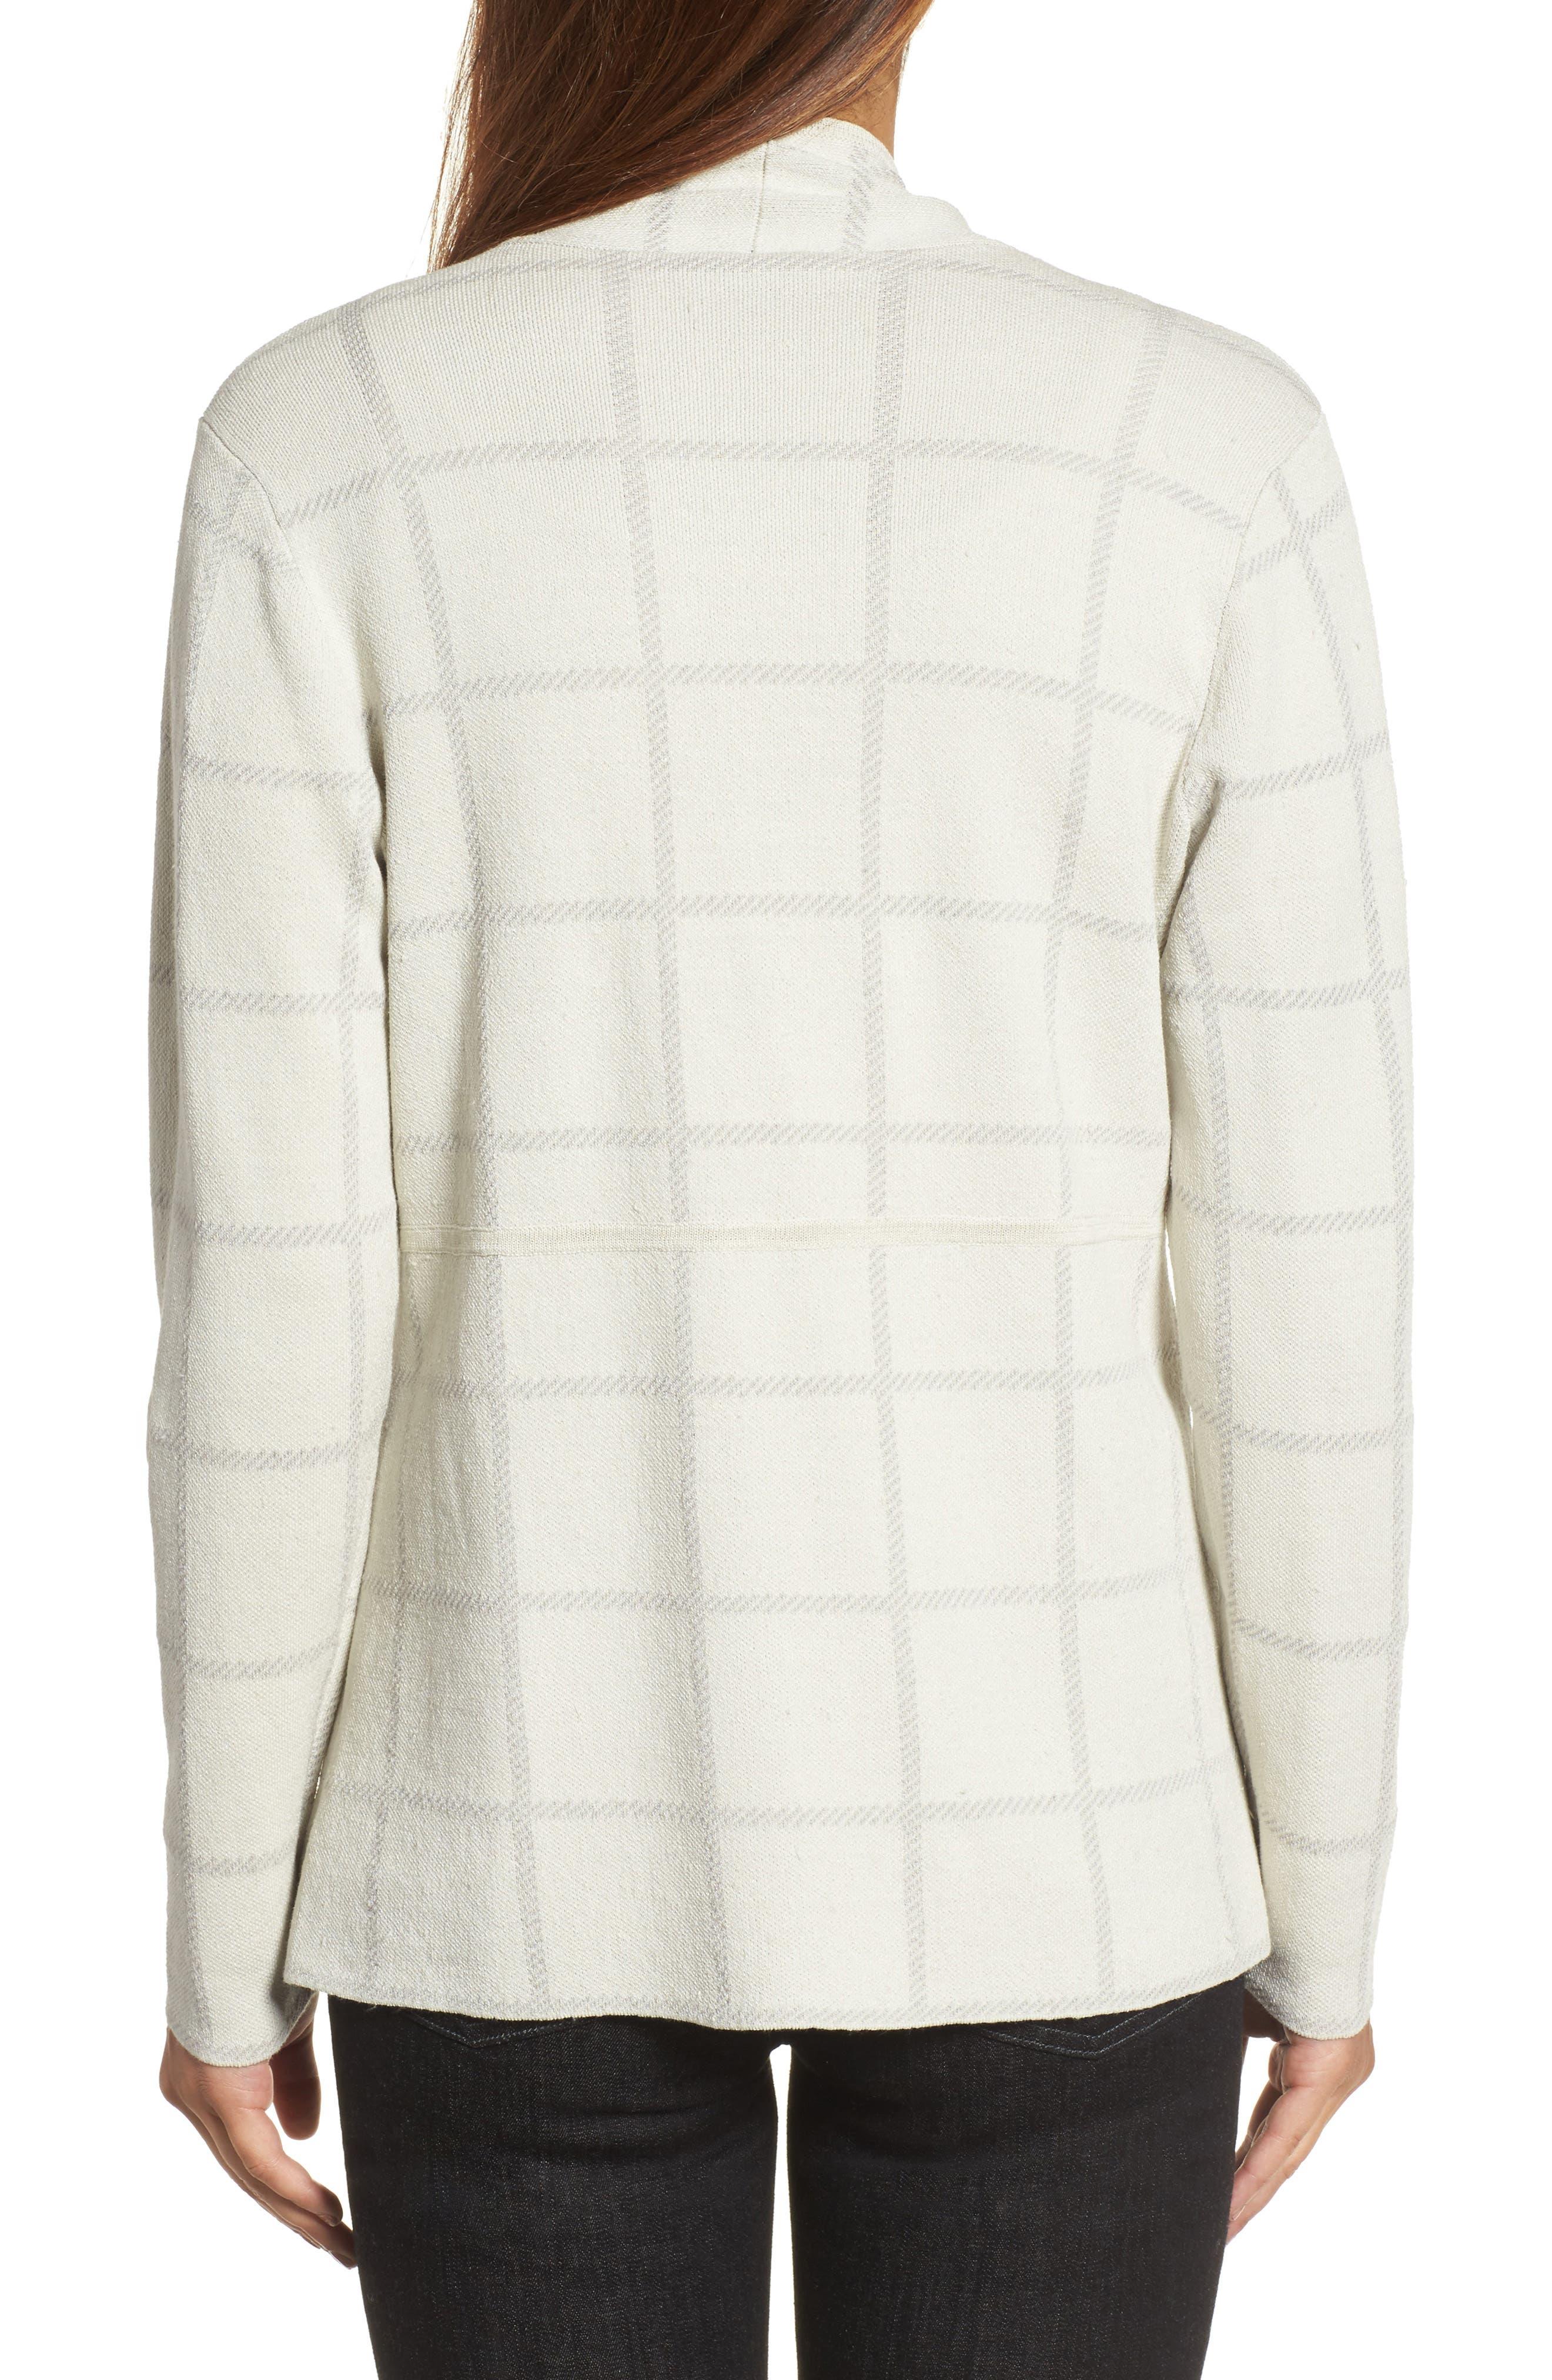 Alternate Image 2  - Eileen Fisher Linen Blend Angle Front Cardigan